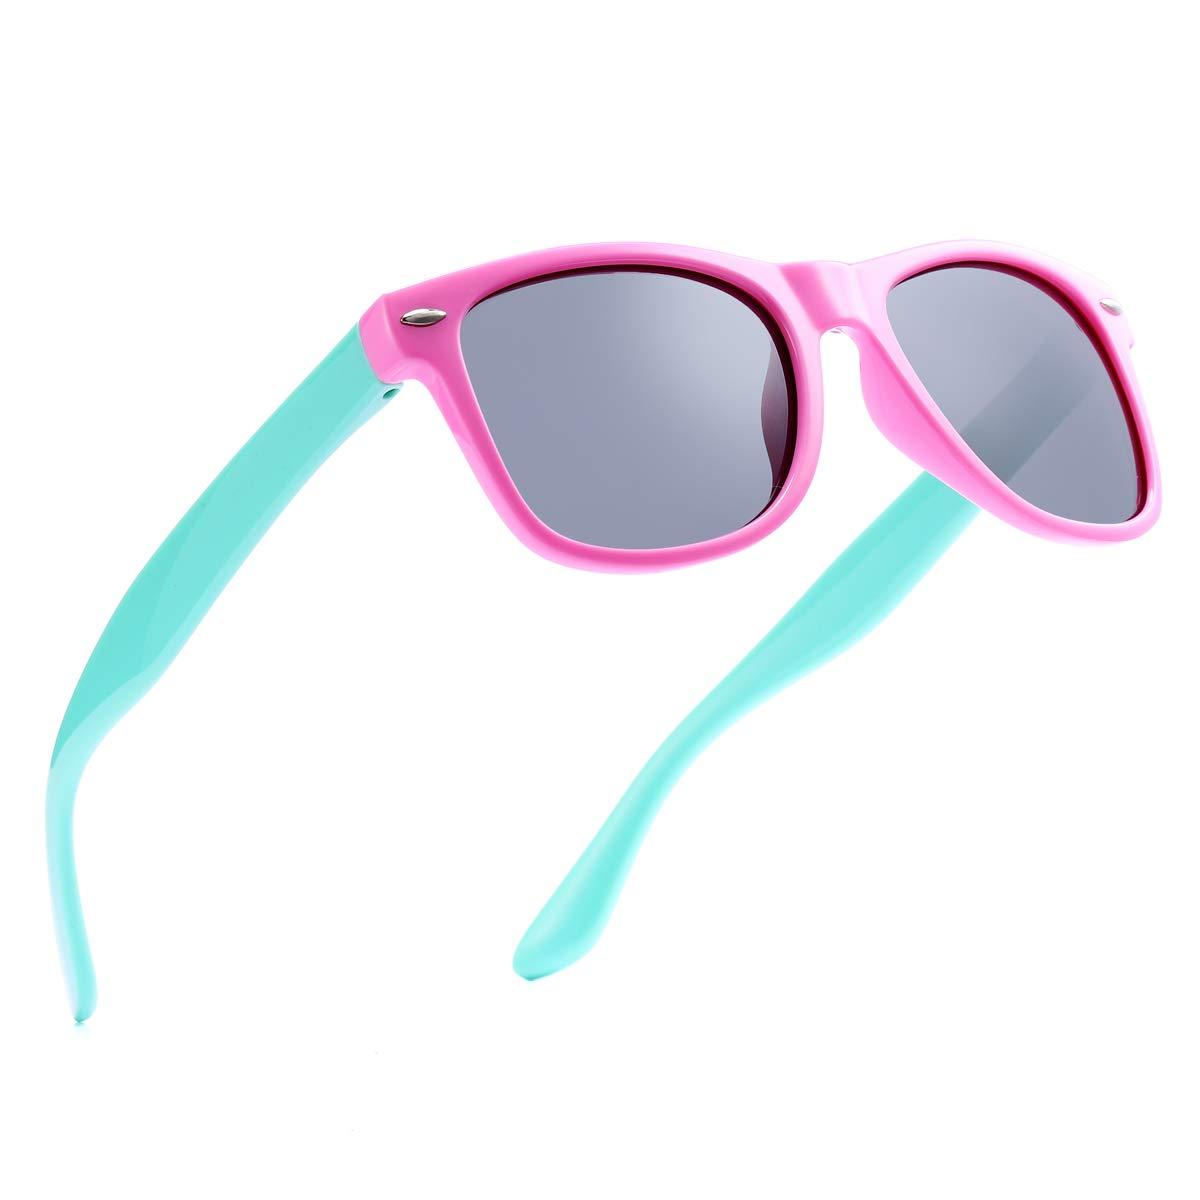 Pro Acme TPEE Rubber Flexible Polarized Sunglasses (Pink Frame/Black Lens/54) by Pro Acme